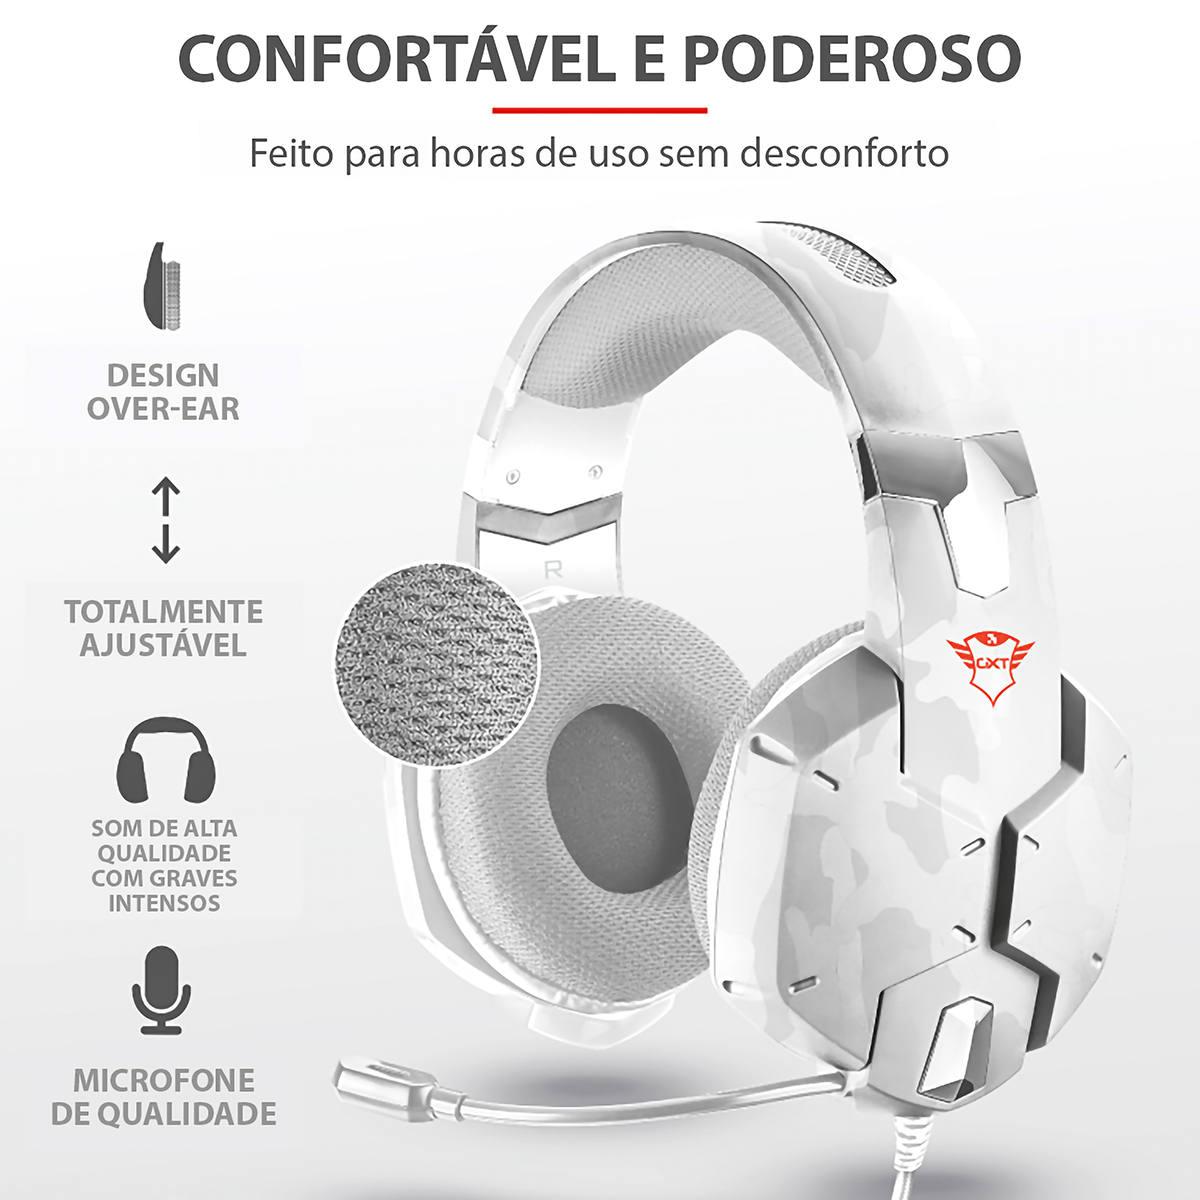 Headset Gamer Carus Multiplataforma Som Potente Drivers 50mm Cabo 2m Trust GXT 322W Snow Camo Branco Camuflado